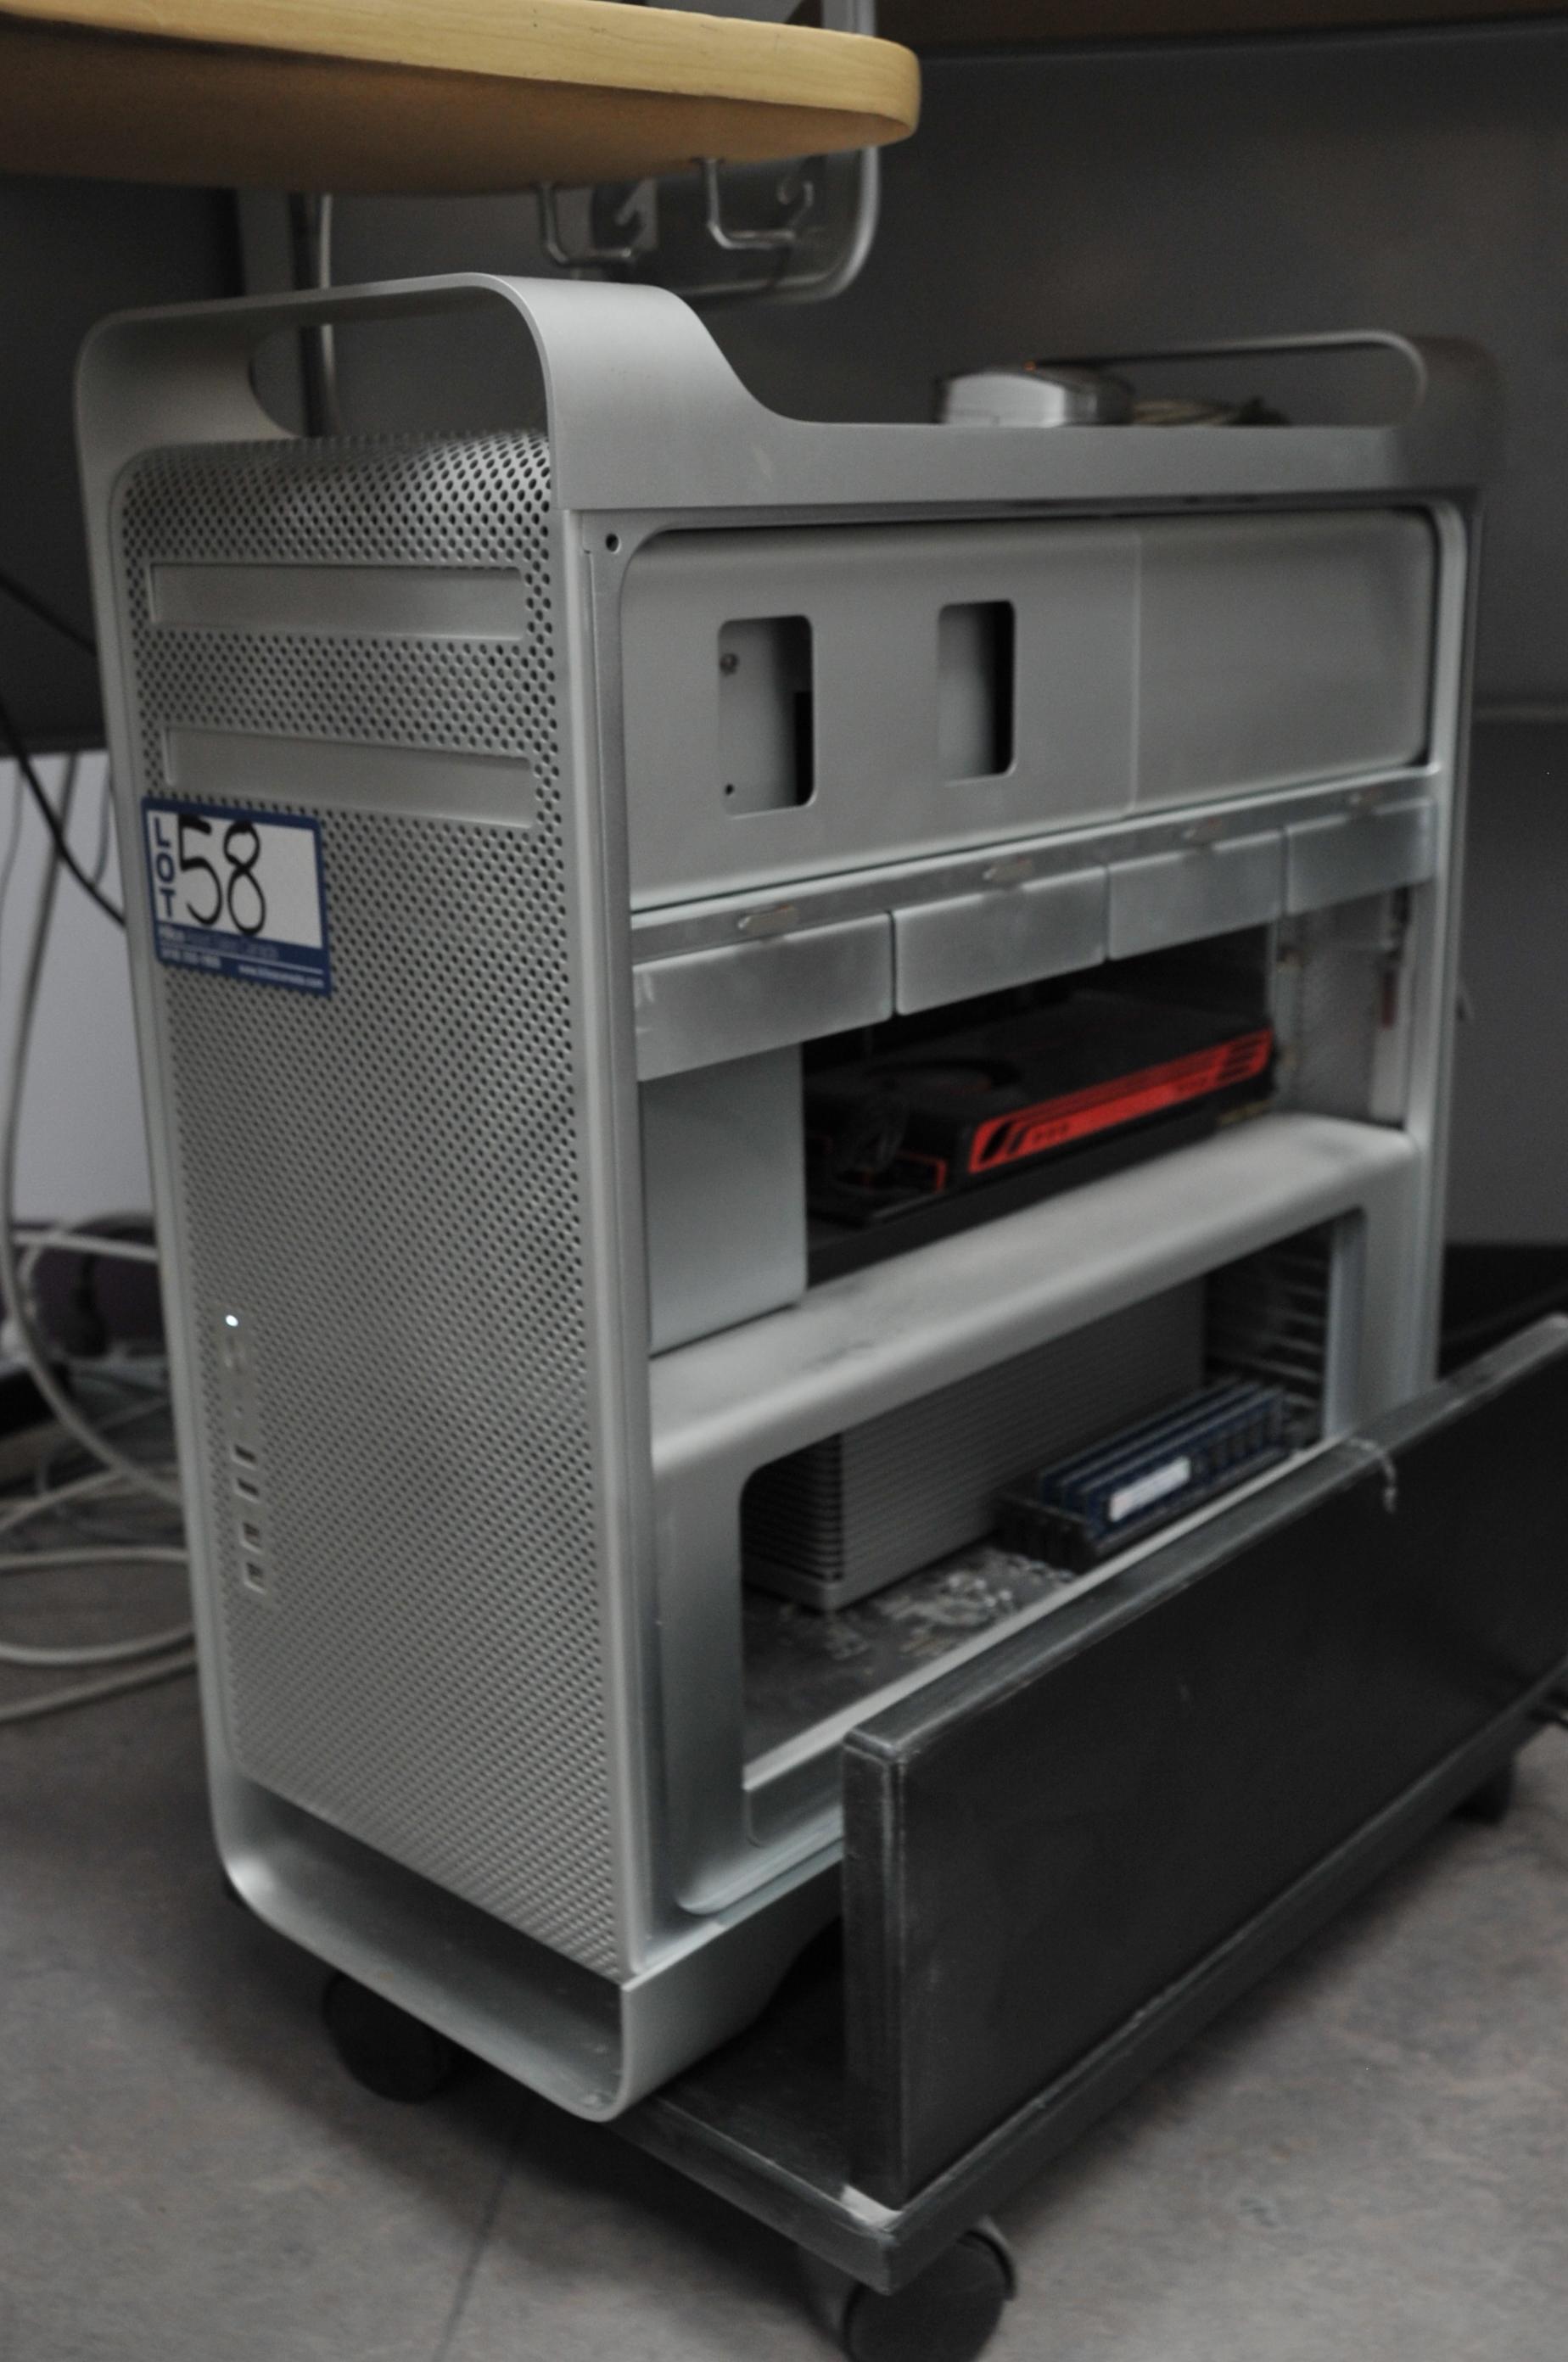 Mac Model Pro G5 Quad Core 2.8Ghz Xeon Processor; Serial Number: H00471R9EUG; 6Gb DDR3 Memory, ATI